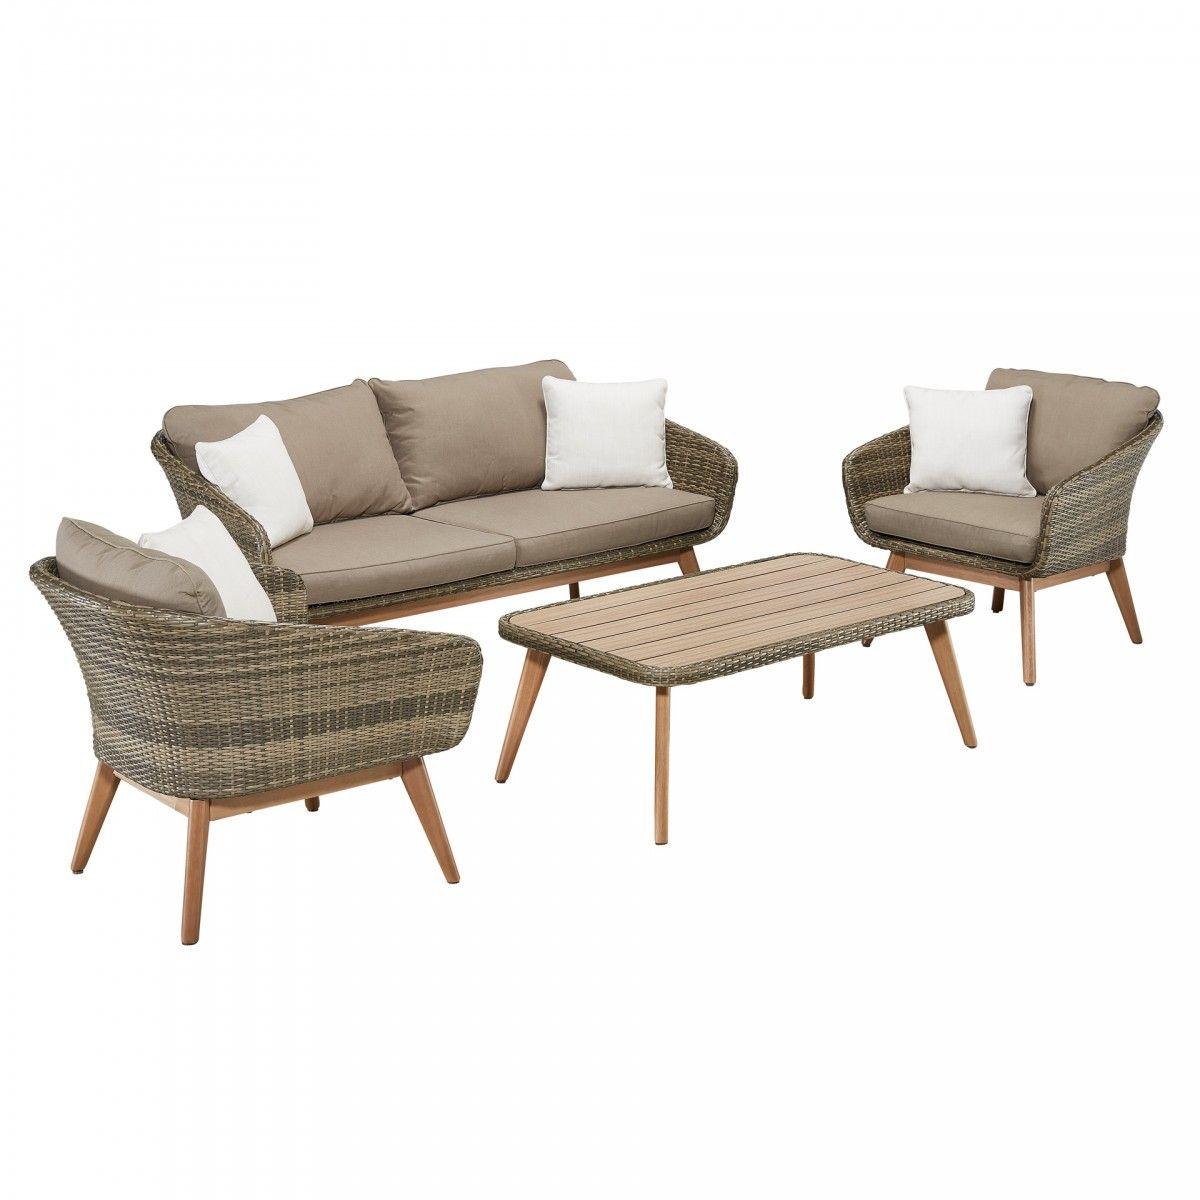 Lounge-Set New York (4-teilig, Polyrattan, beige, Jutlandia)   Beige